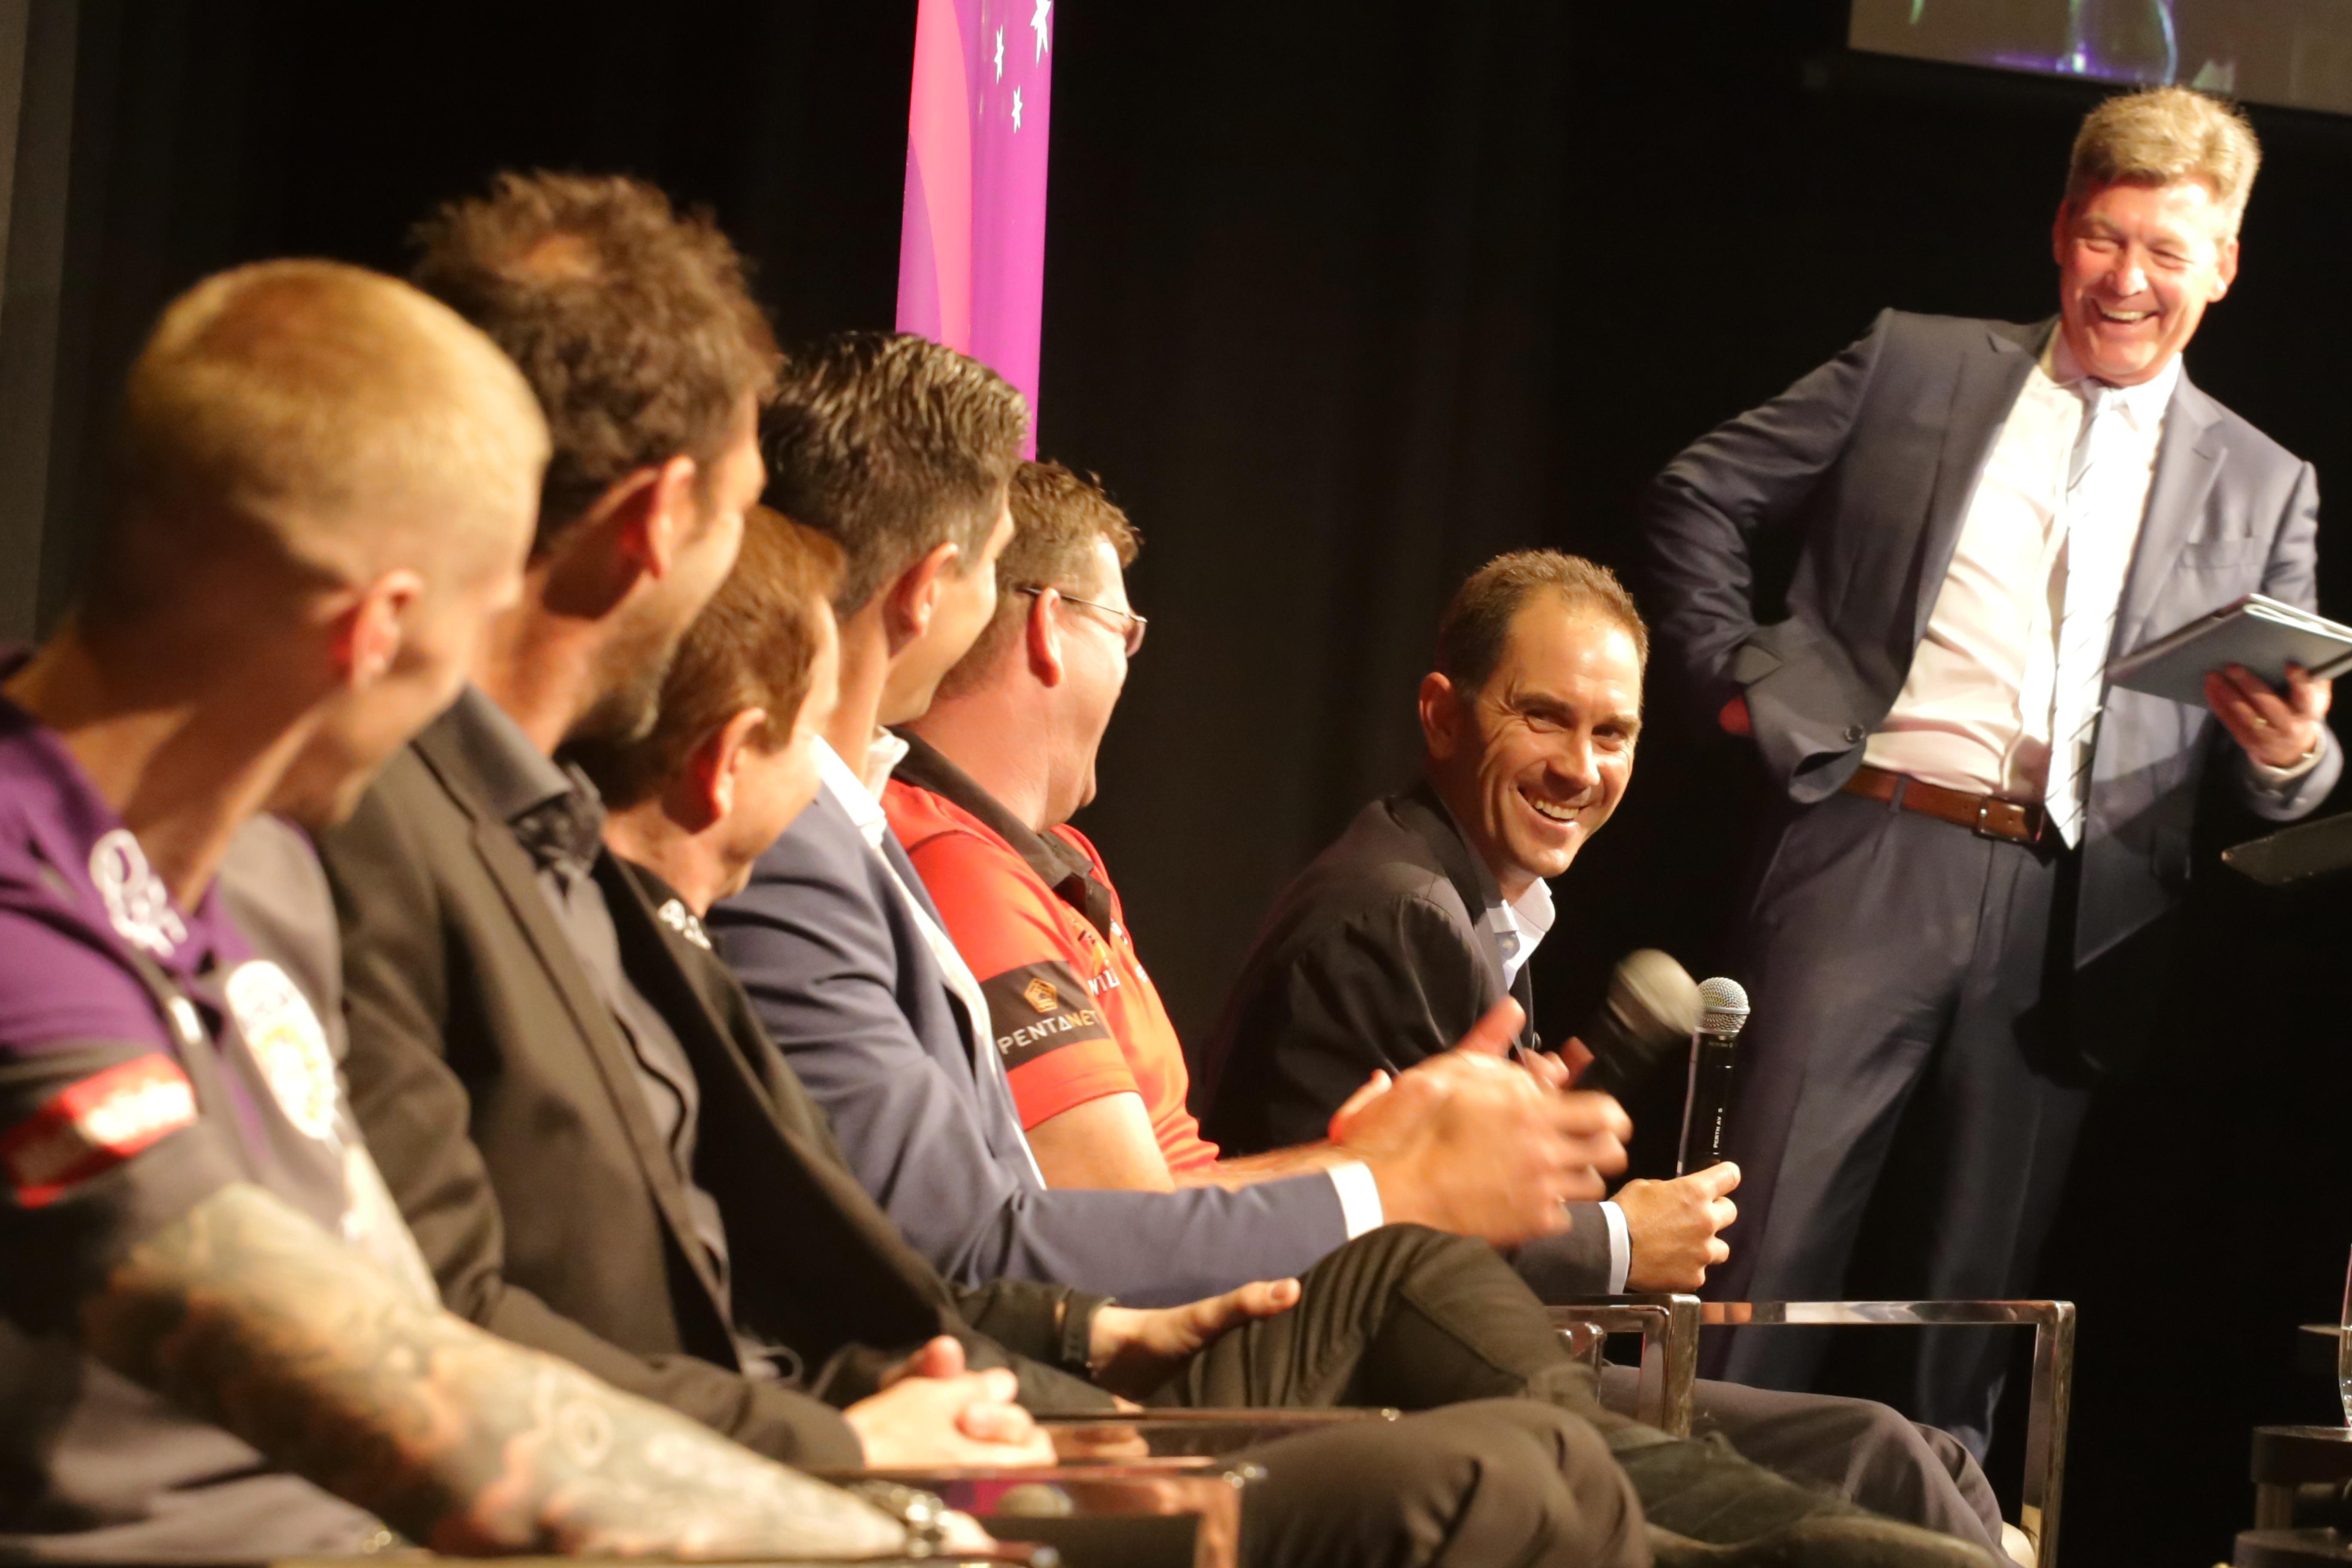 Men on stage